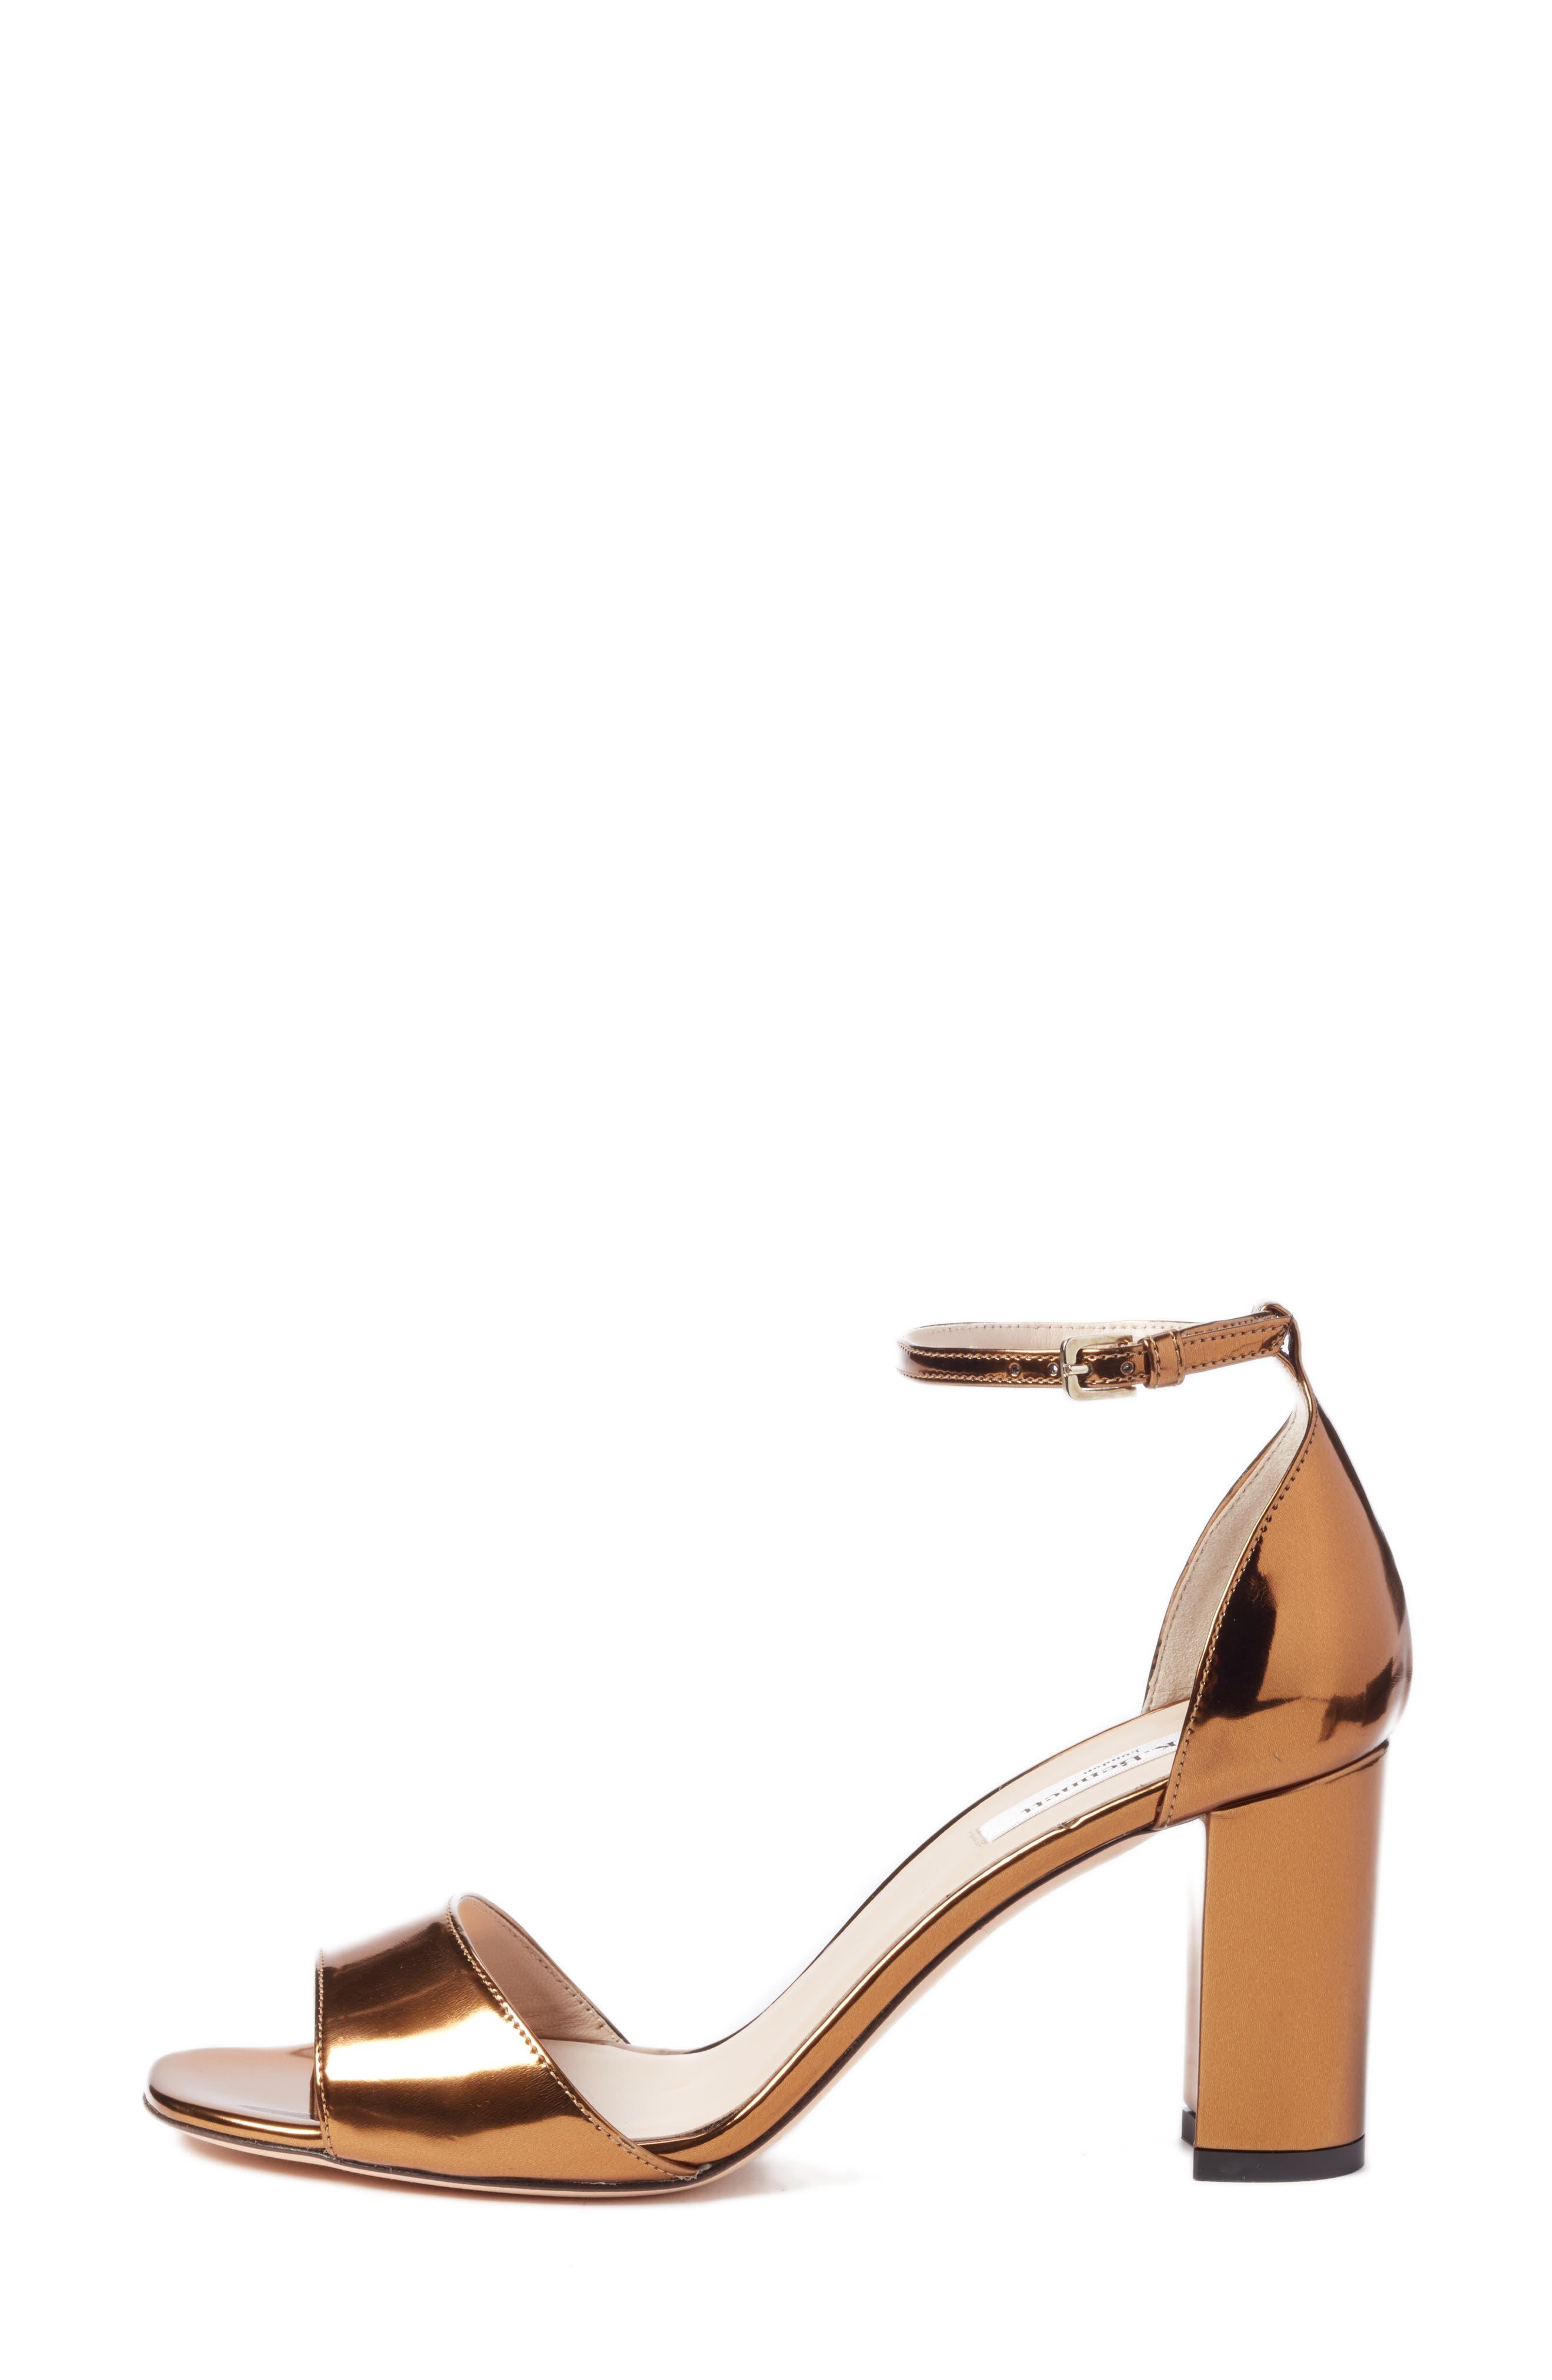 'Helena' Ankle Strap Block Heel Sandal,                             Alternate thumbnail 3, color,                             710